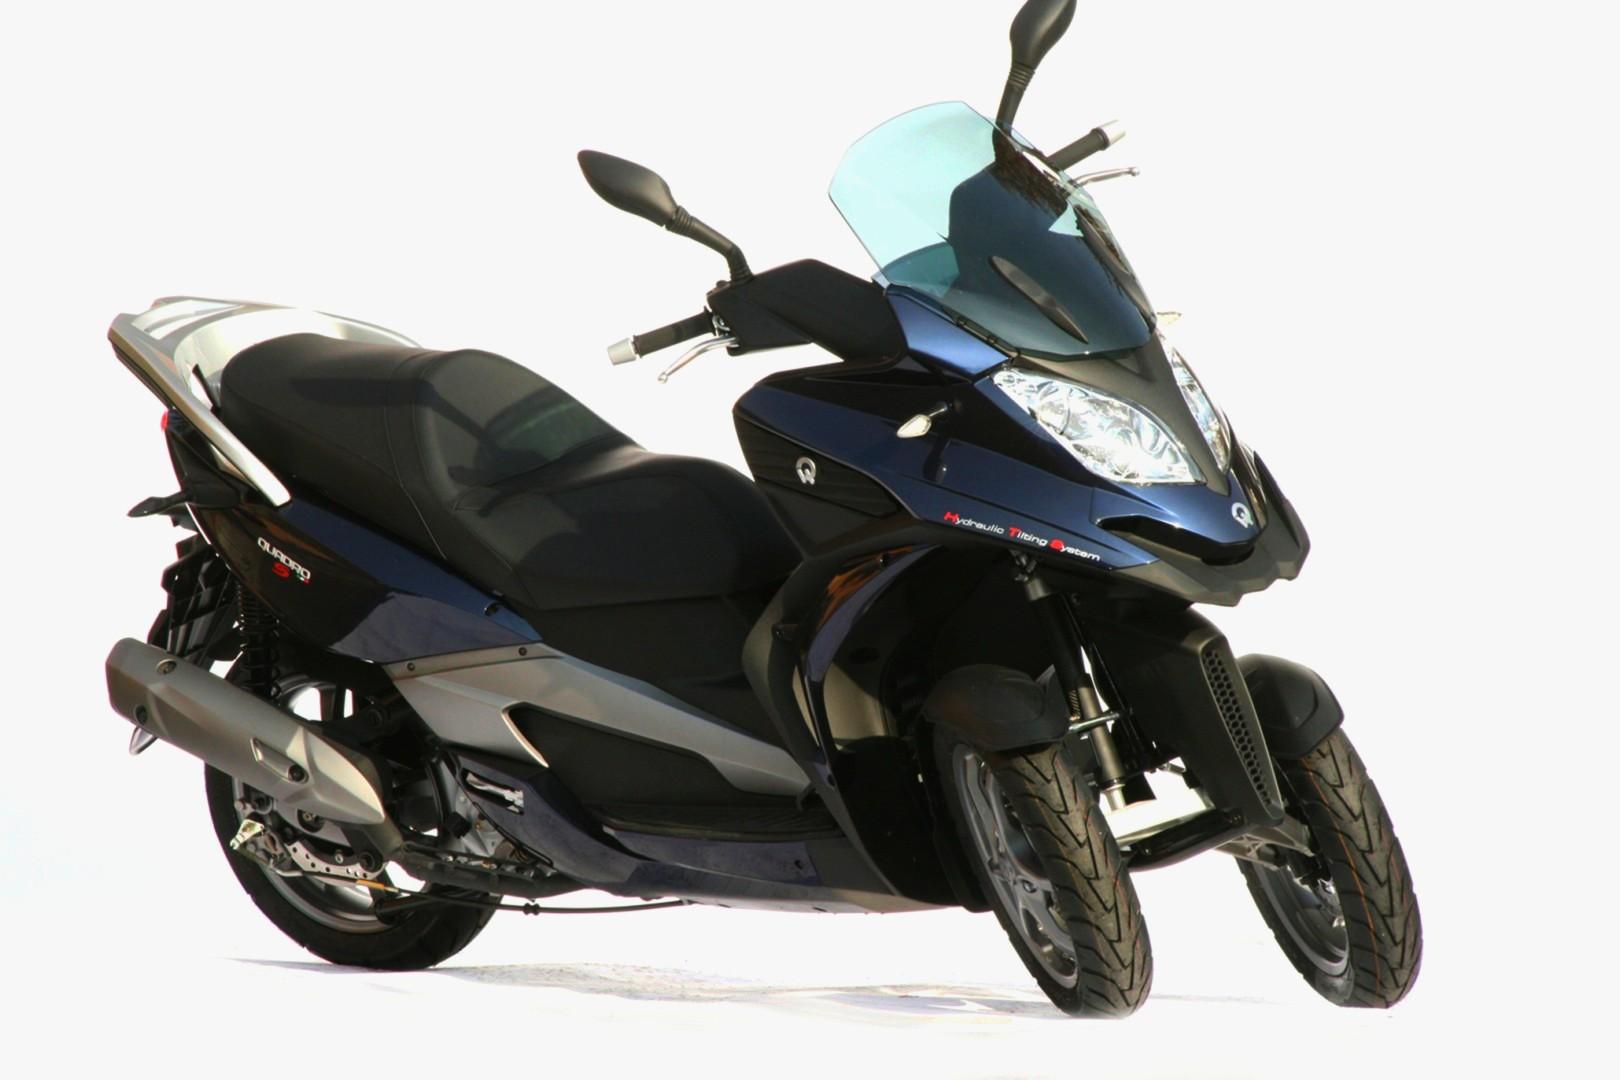 Quadro 350s The New 3 Wheel Scooter Autoevolution